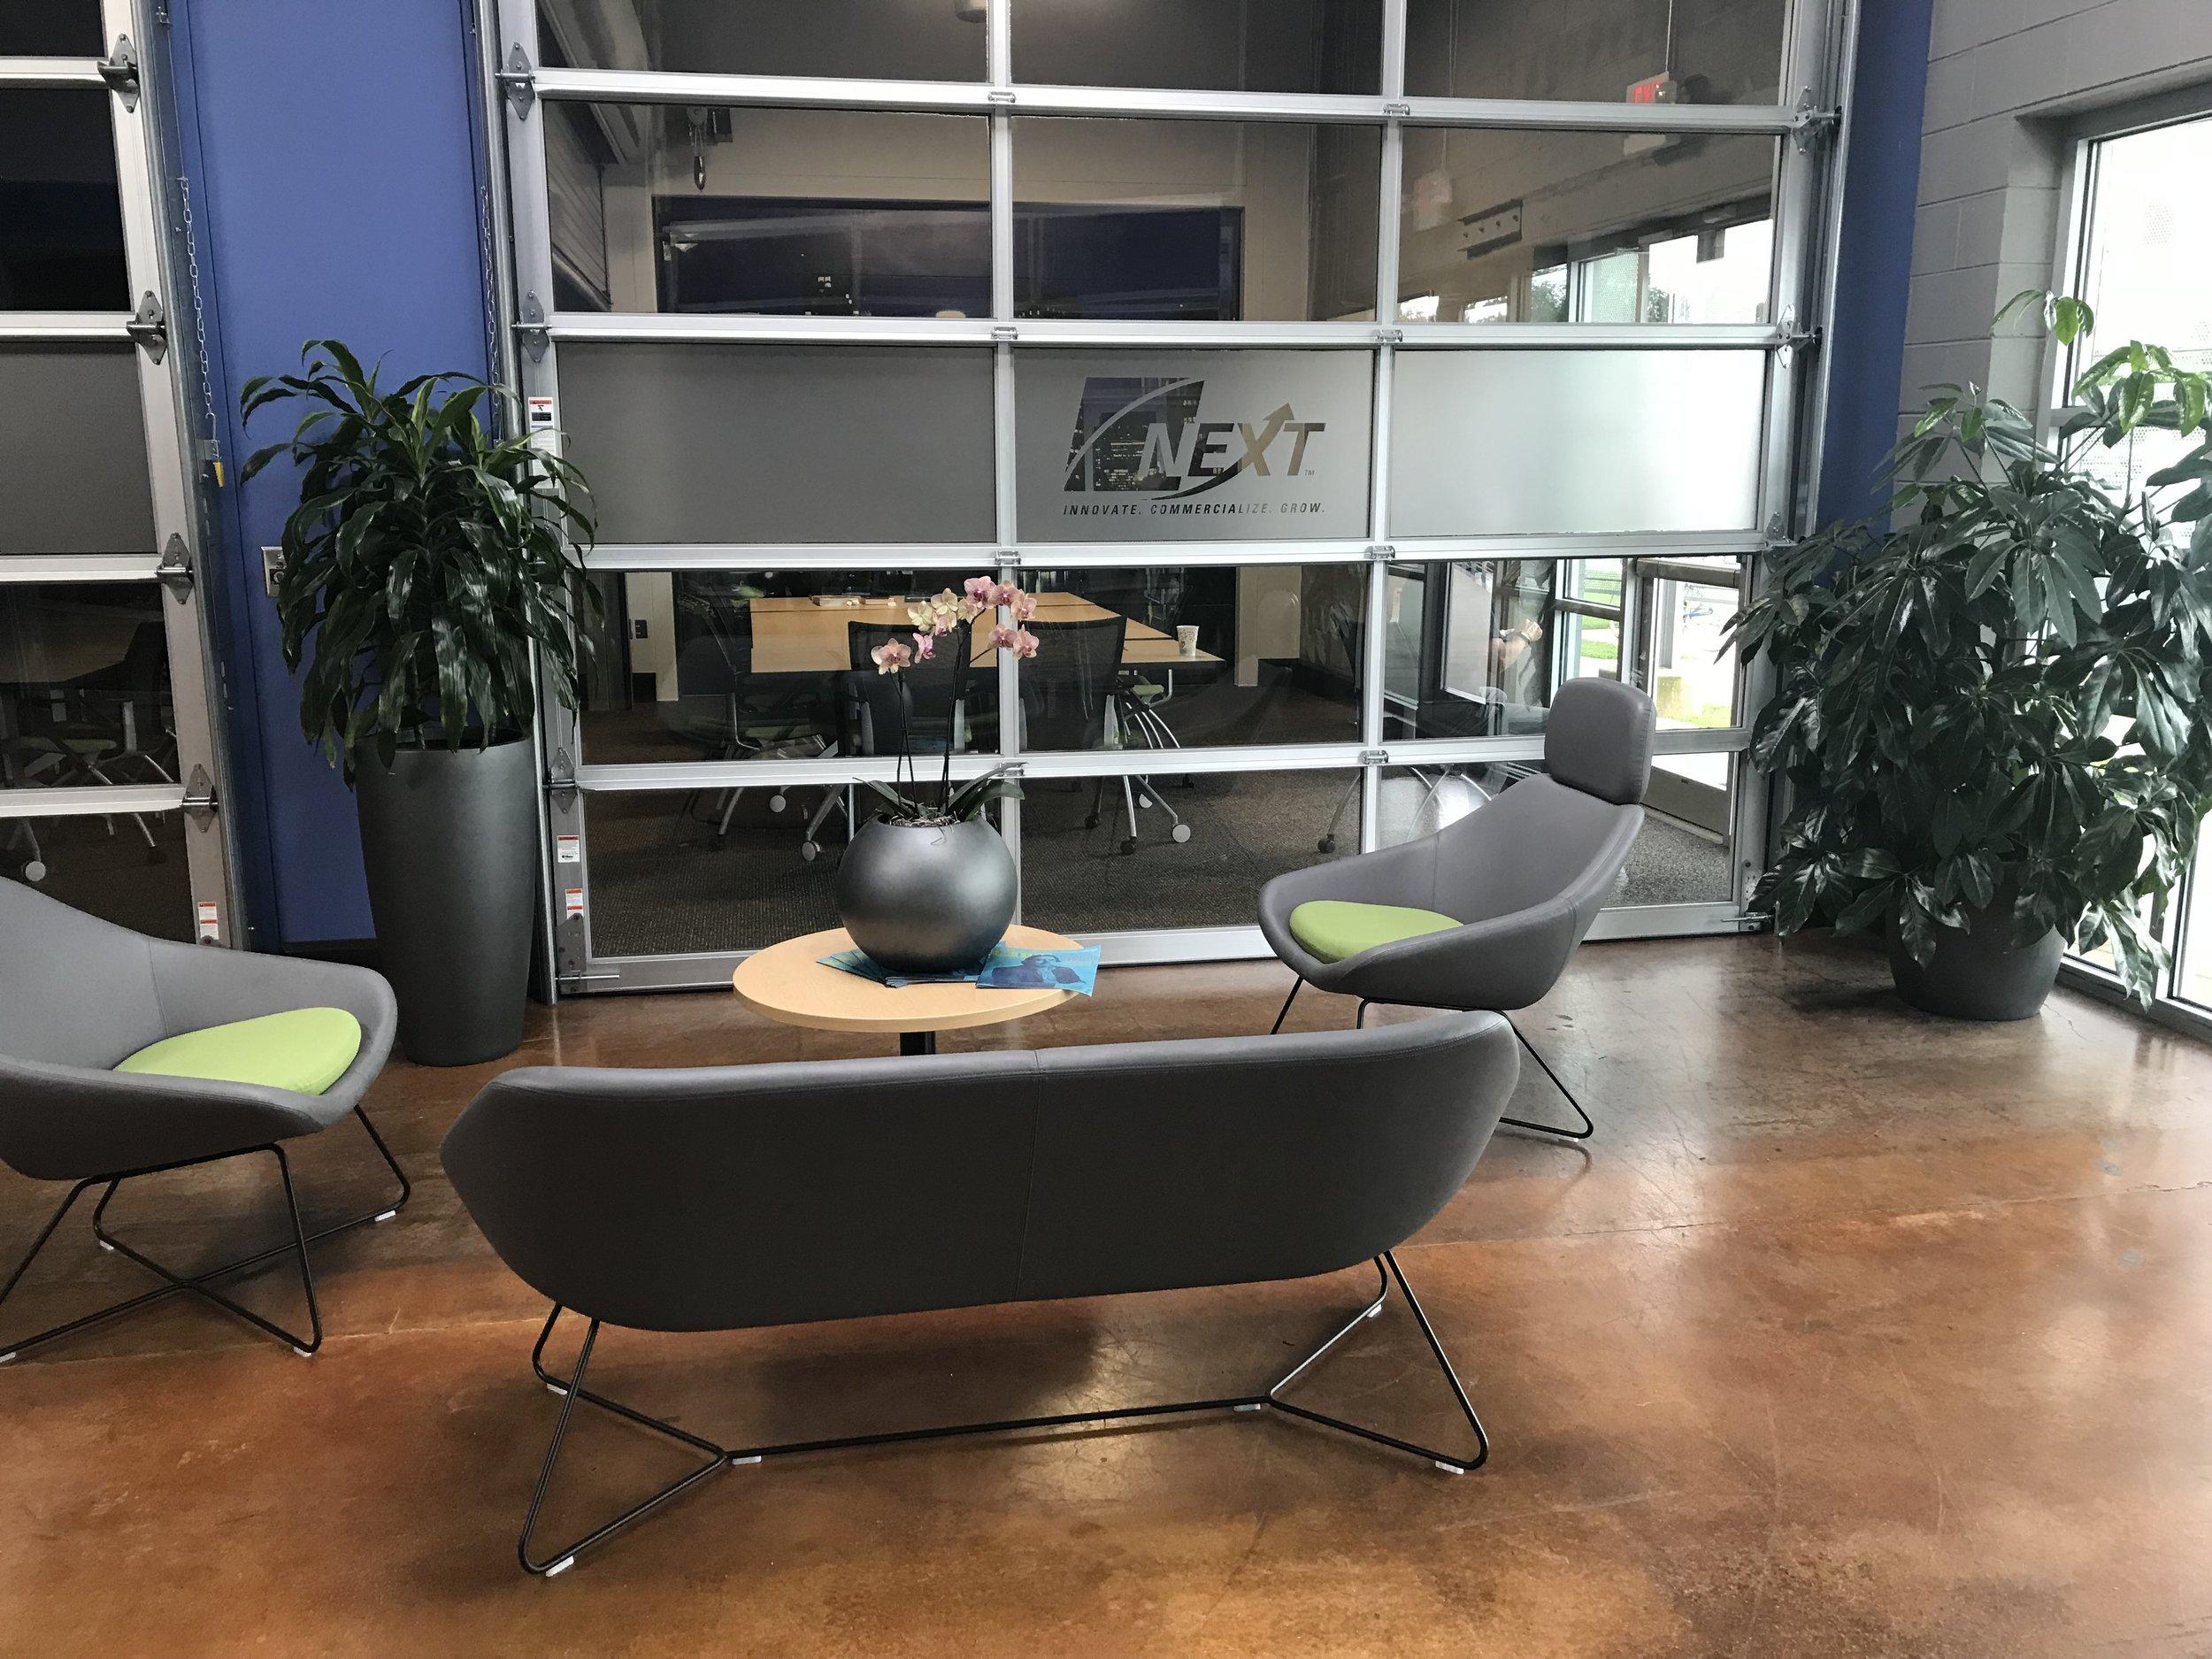 The NEXT Innovation Center